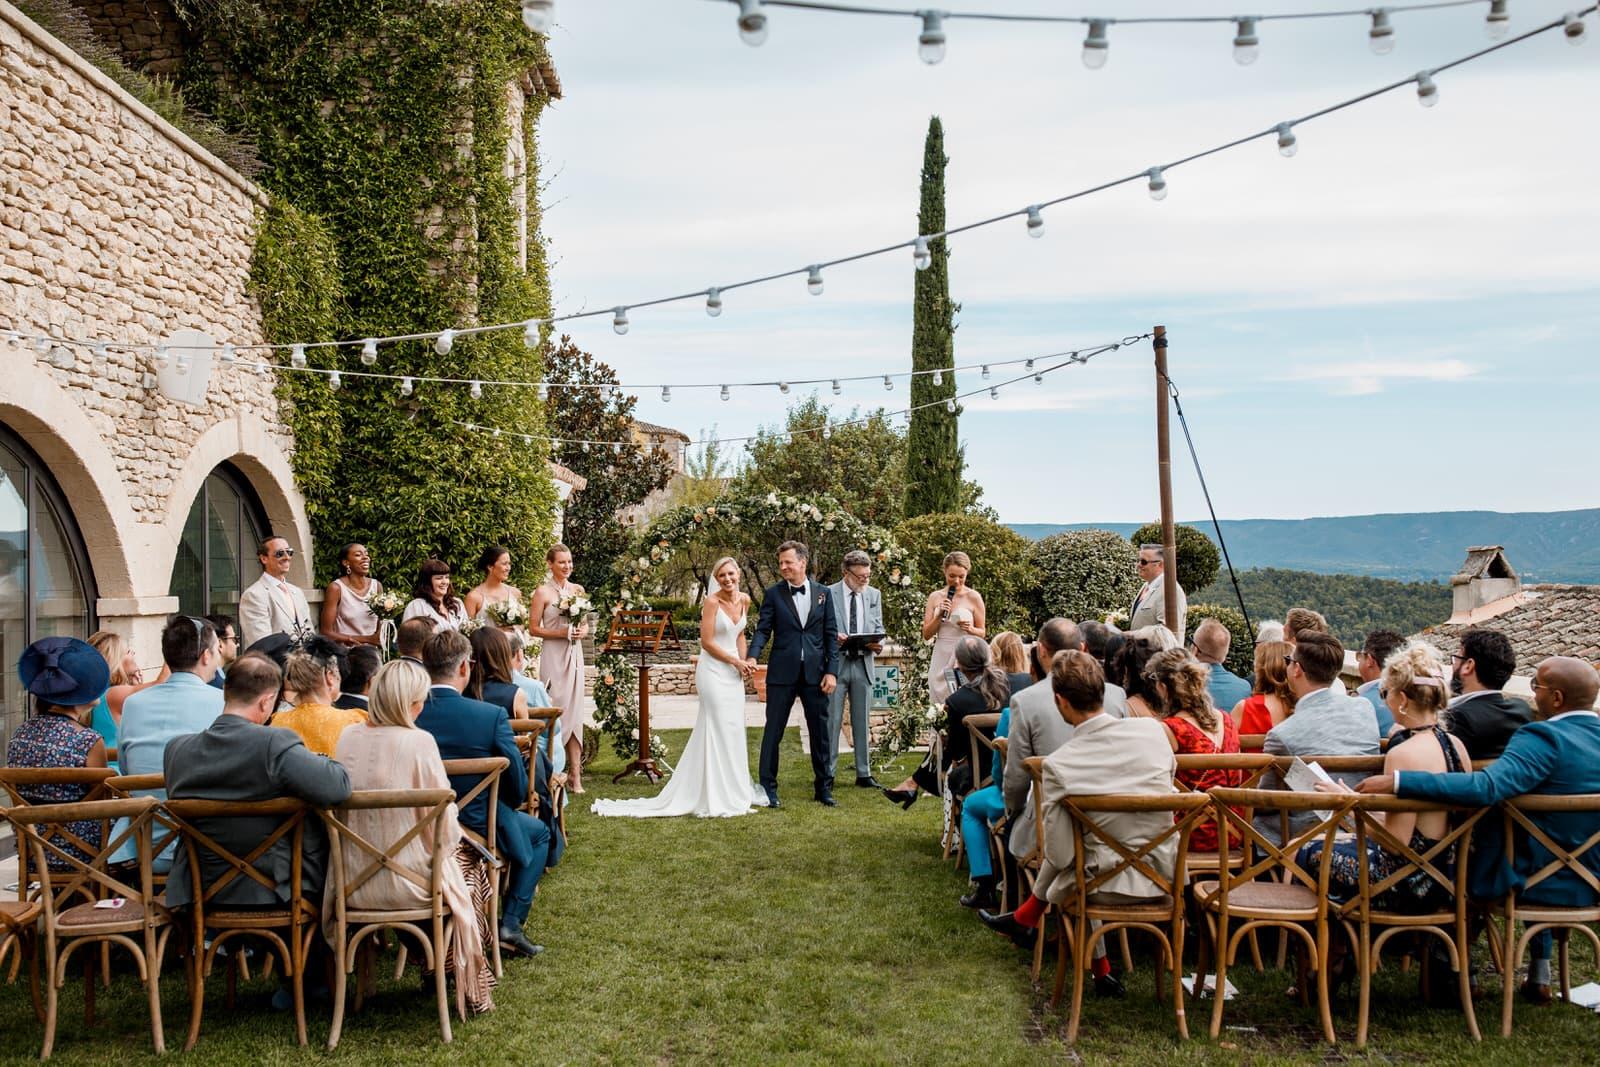 wedding in garden at airelles hotel in bastide de gordes